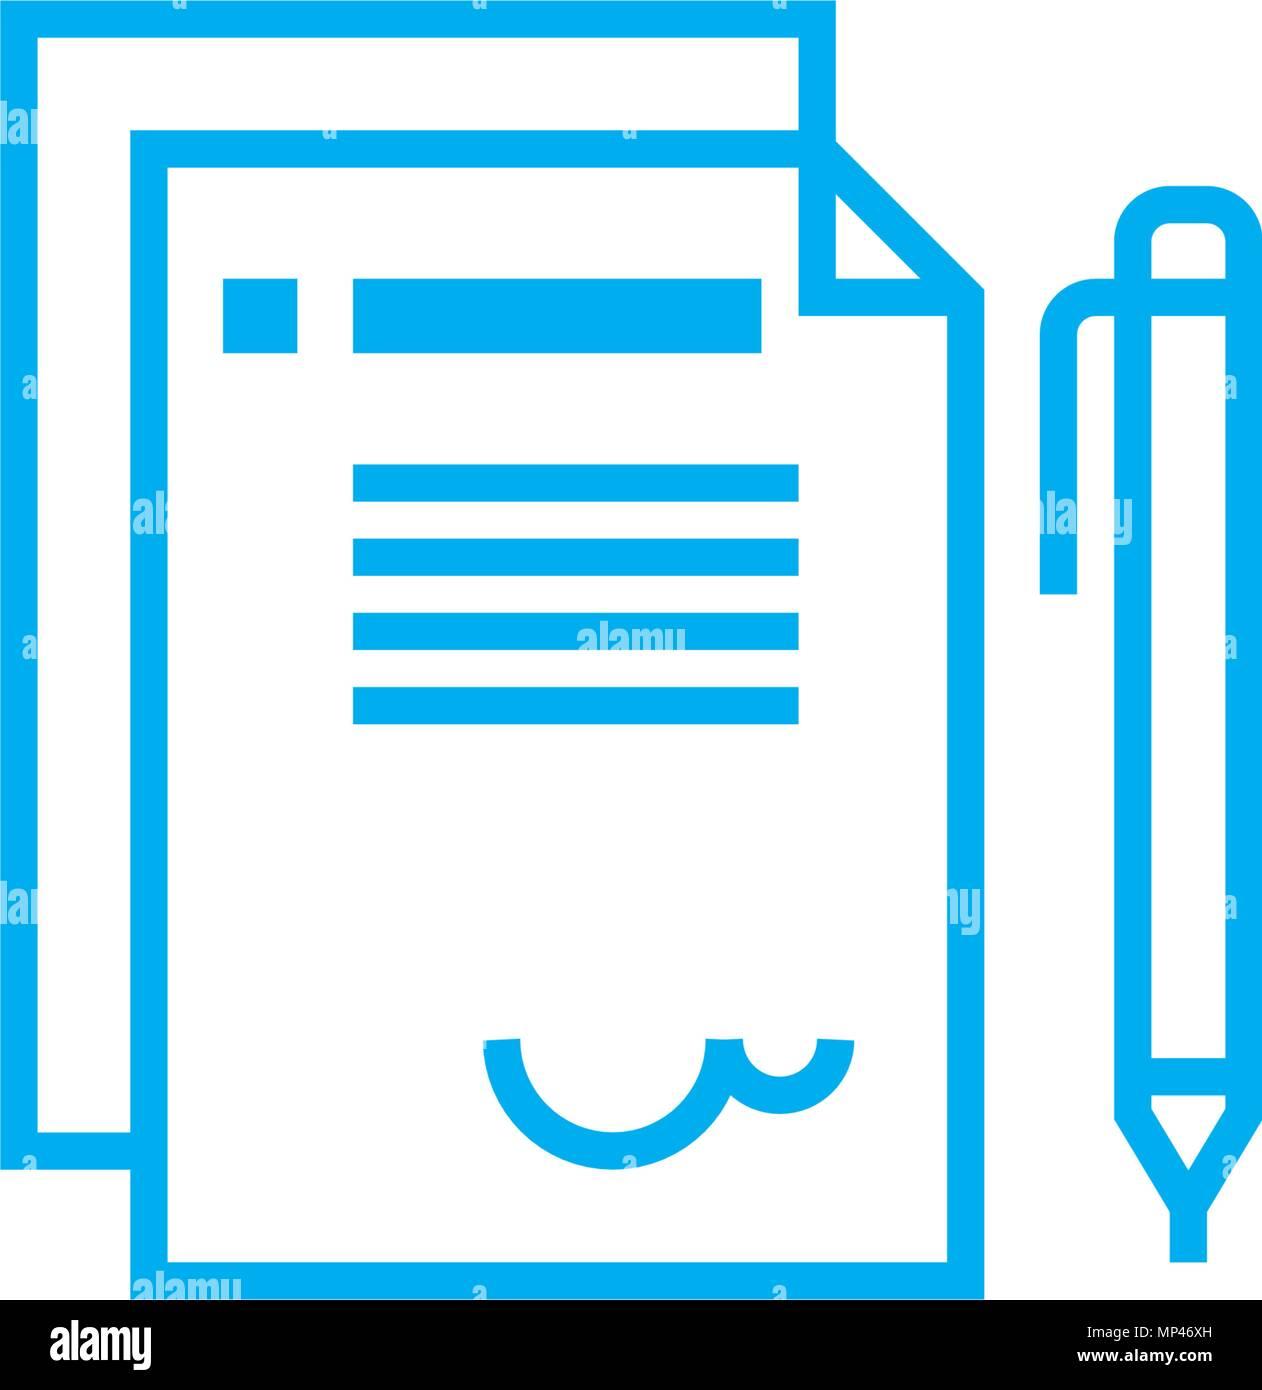 Offizielles Schreiben Lineare Symbol Konzept Offizielles Schreiben